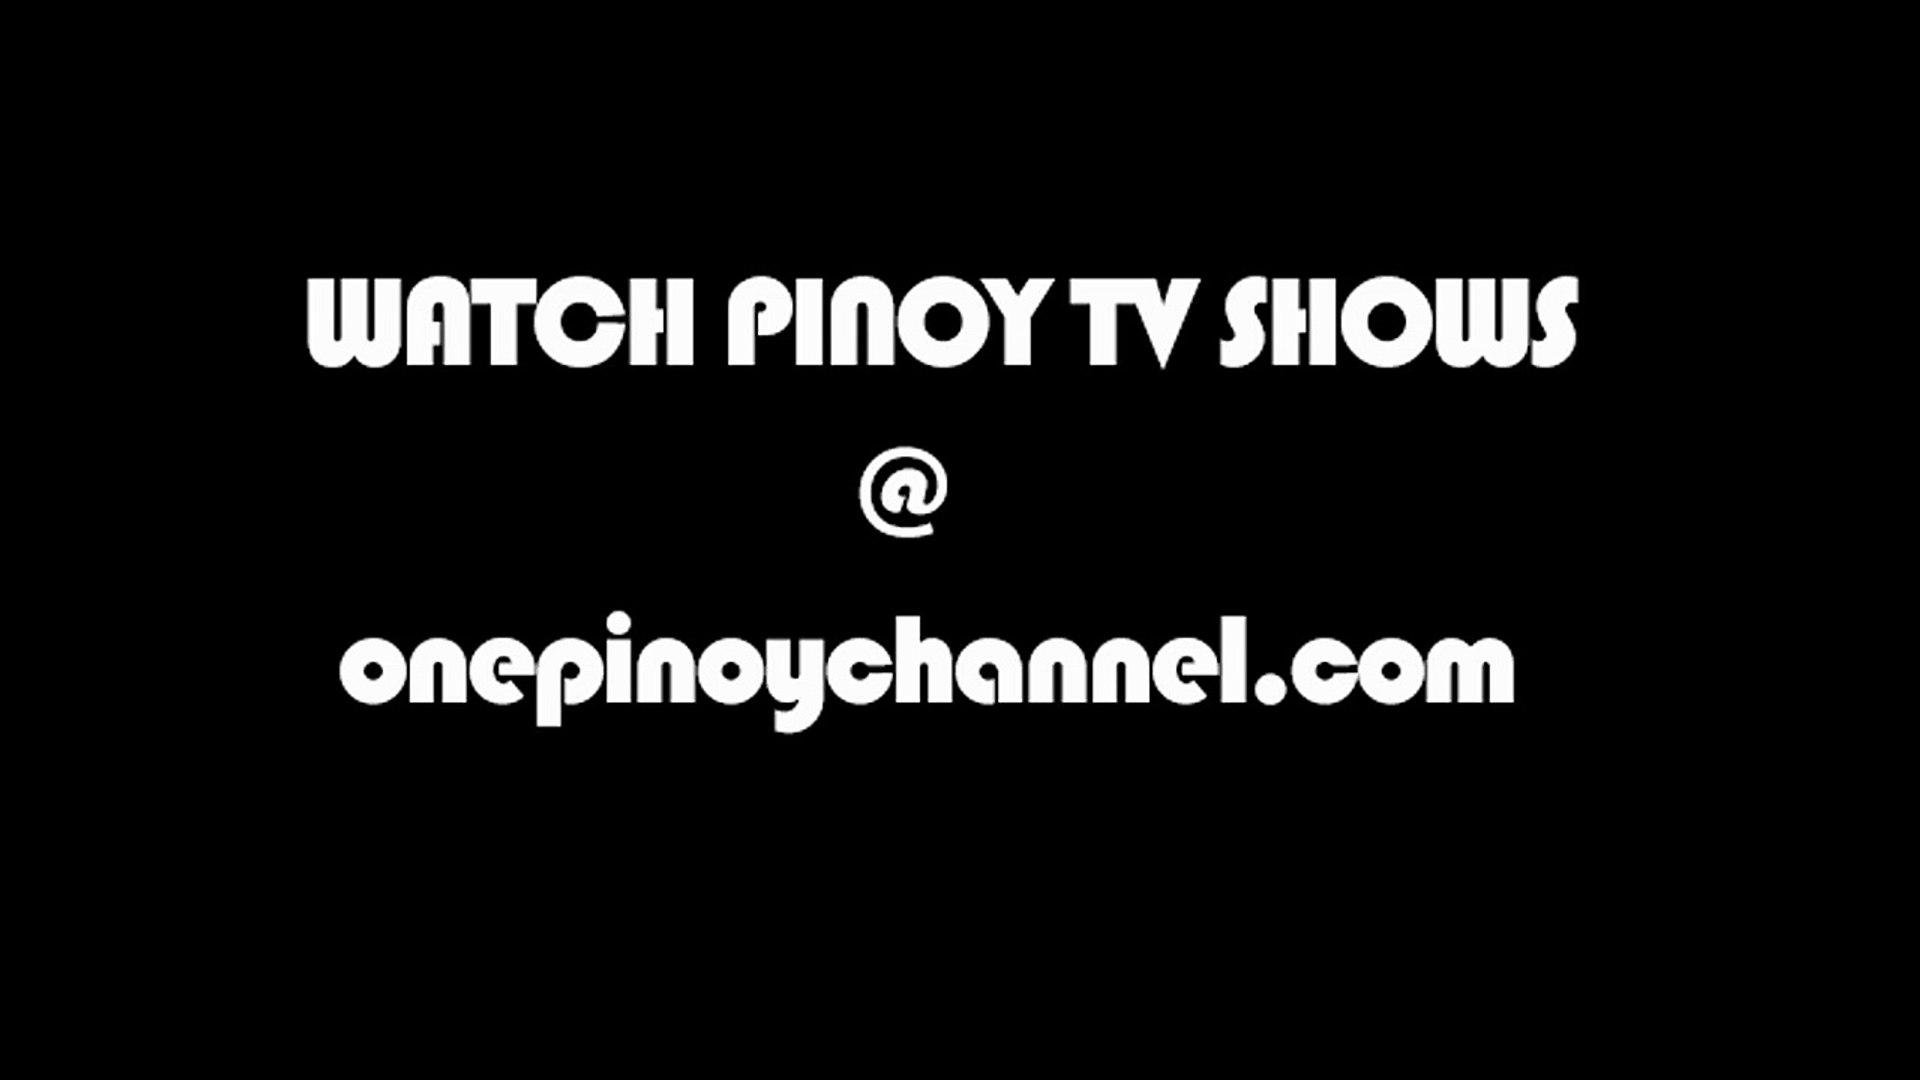 Flix tv pinoy